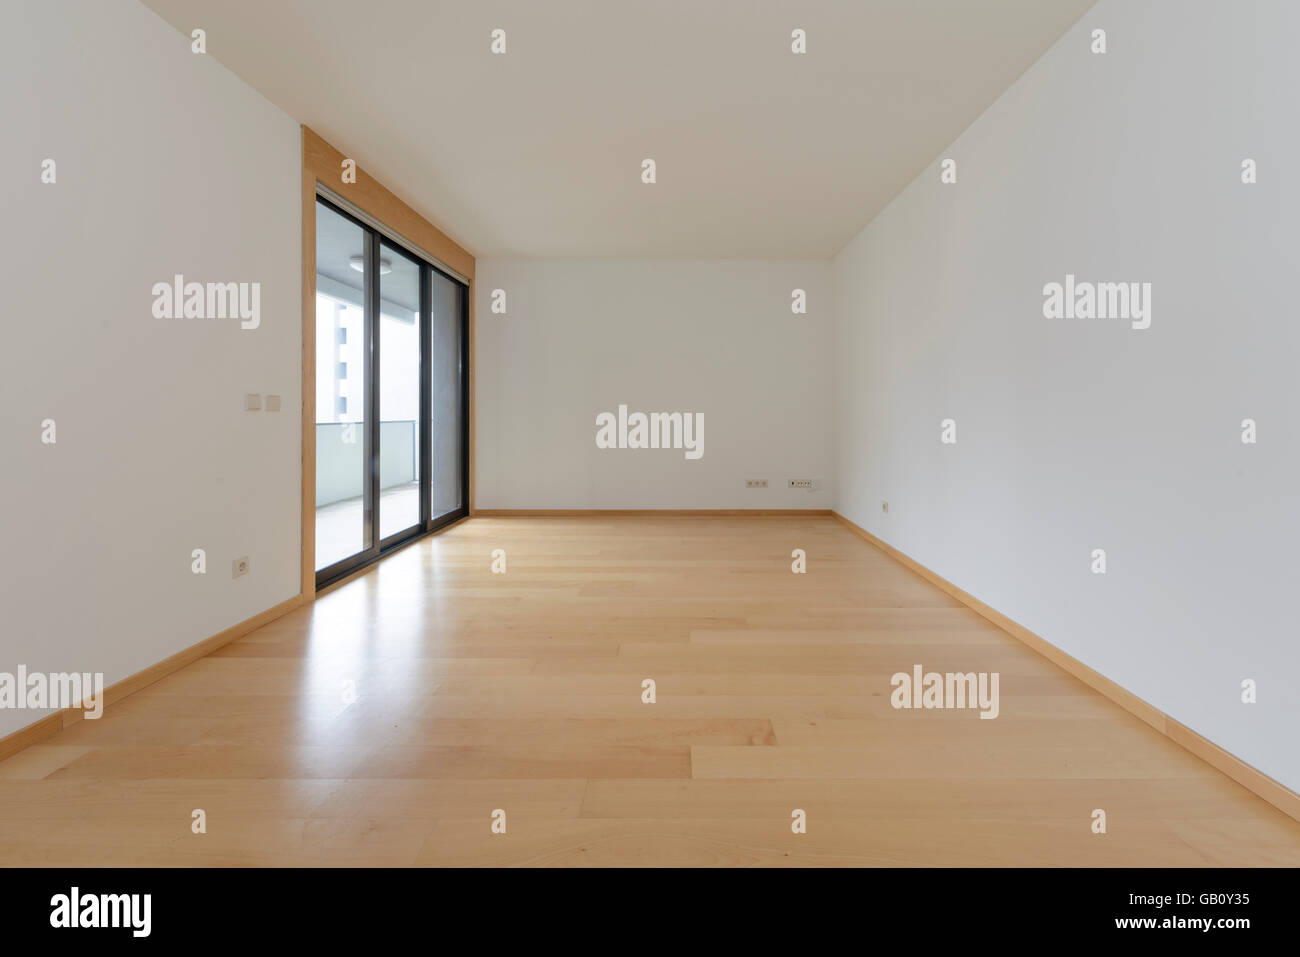 Empty Room With Big Window   Stock Image